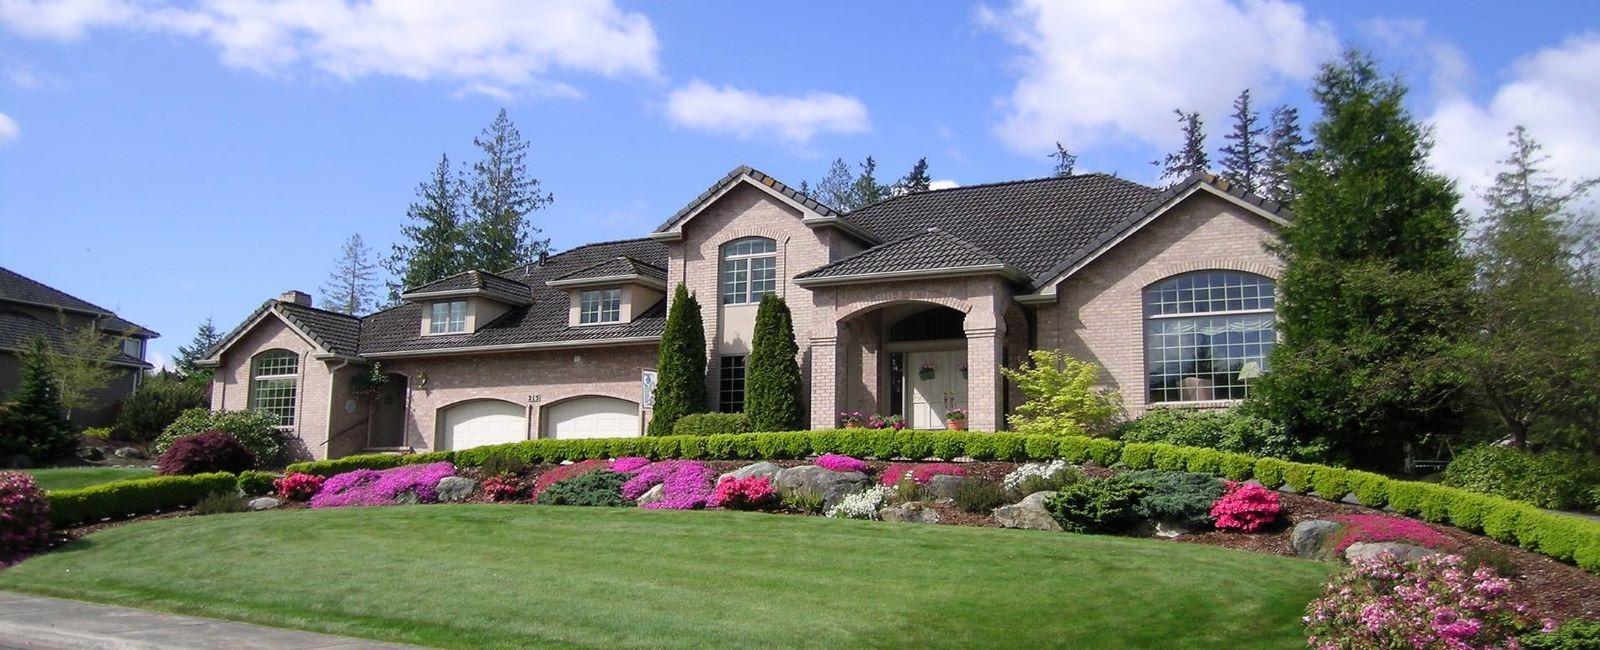 East Brunswick NJ Real Estate & Homes for Sale | Davis Realtors